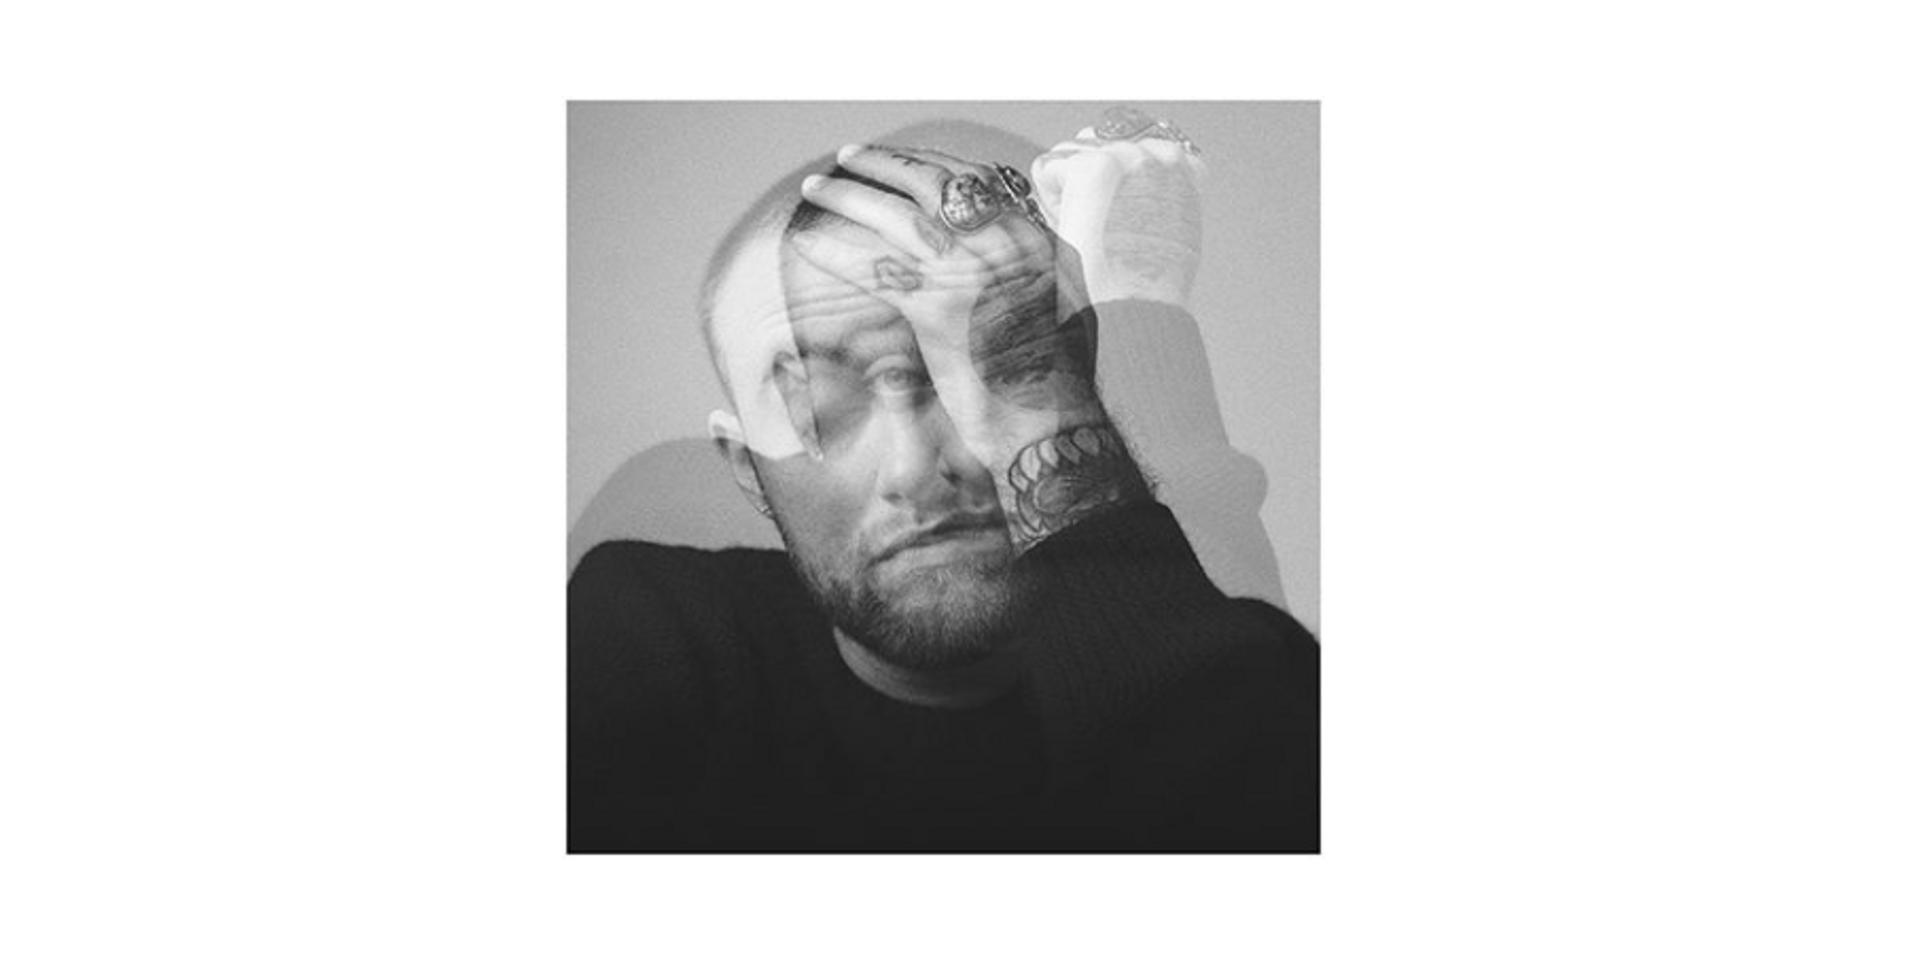 Musicians react to Mac Miller's posthumous album, Circles